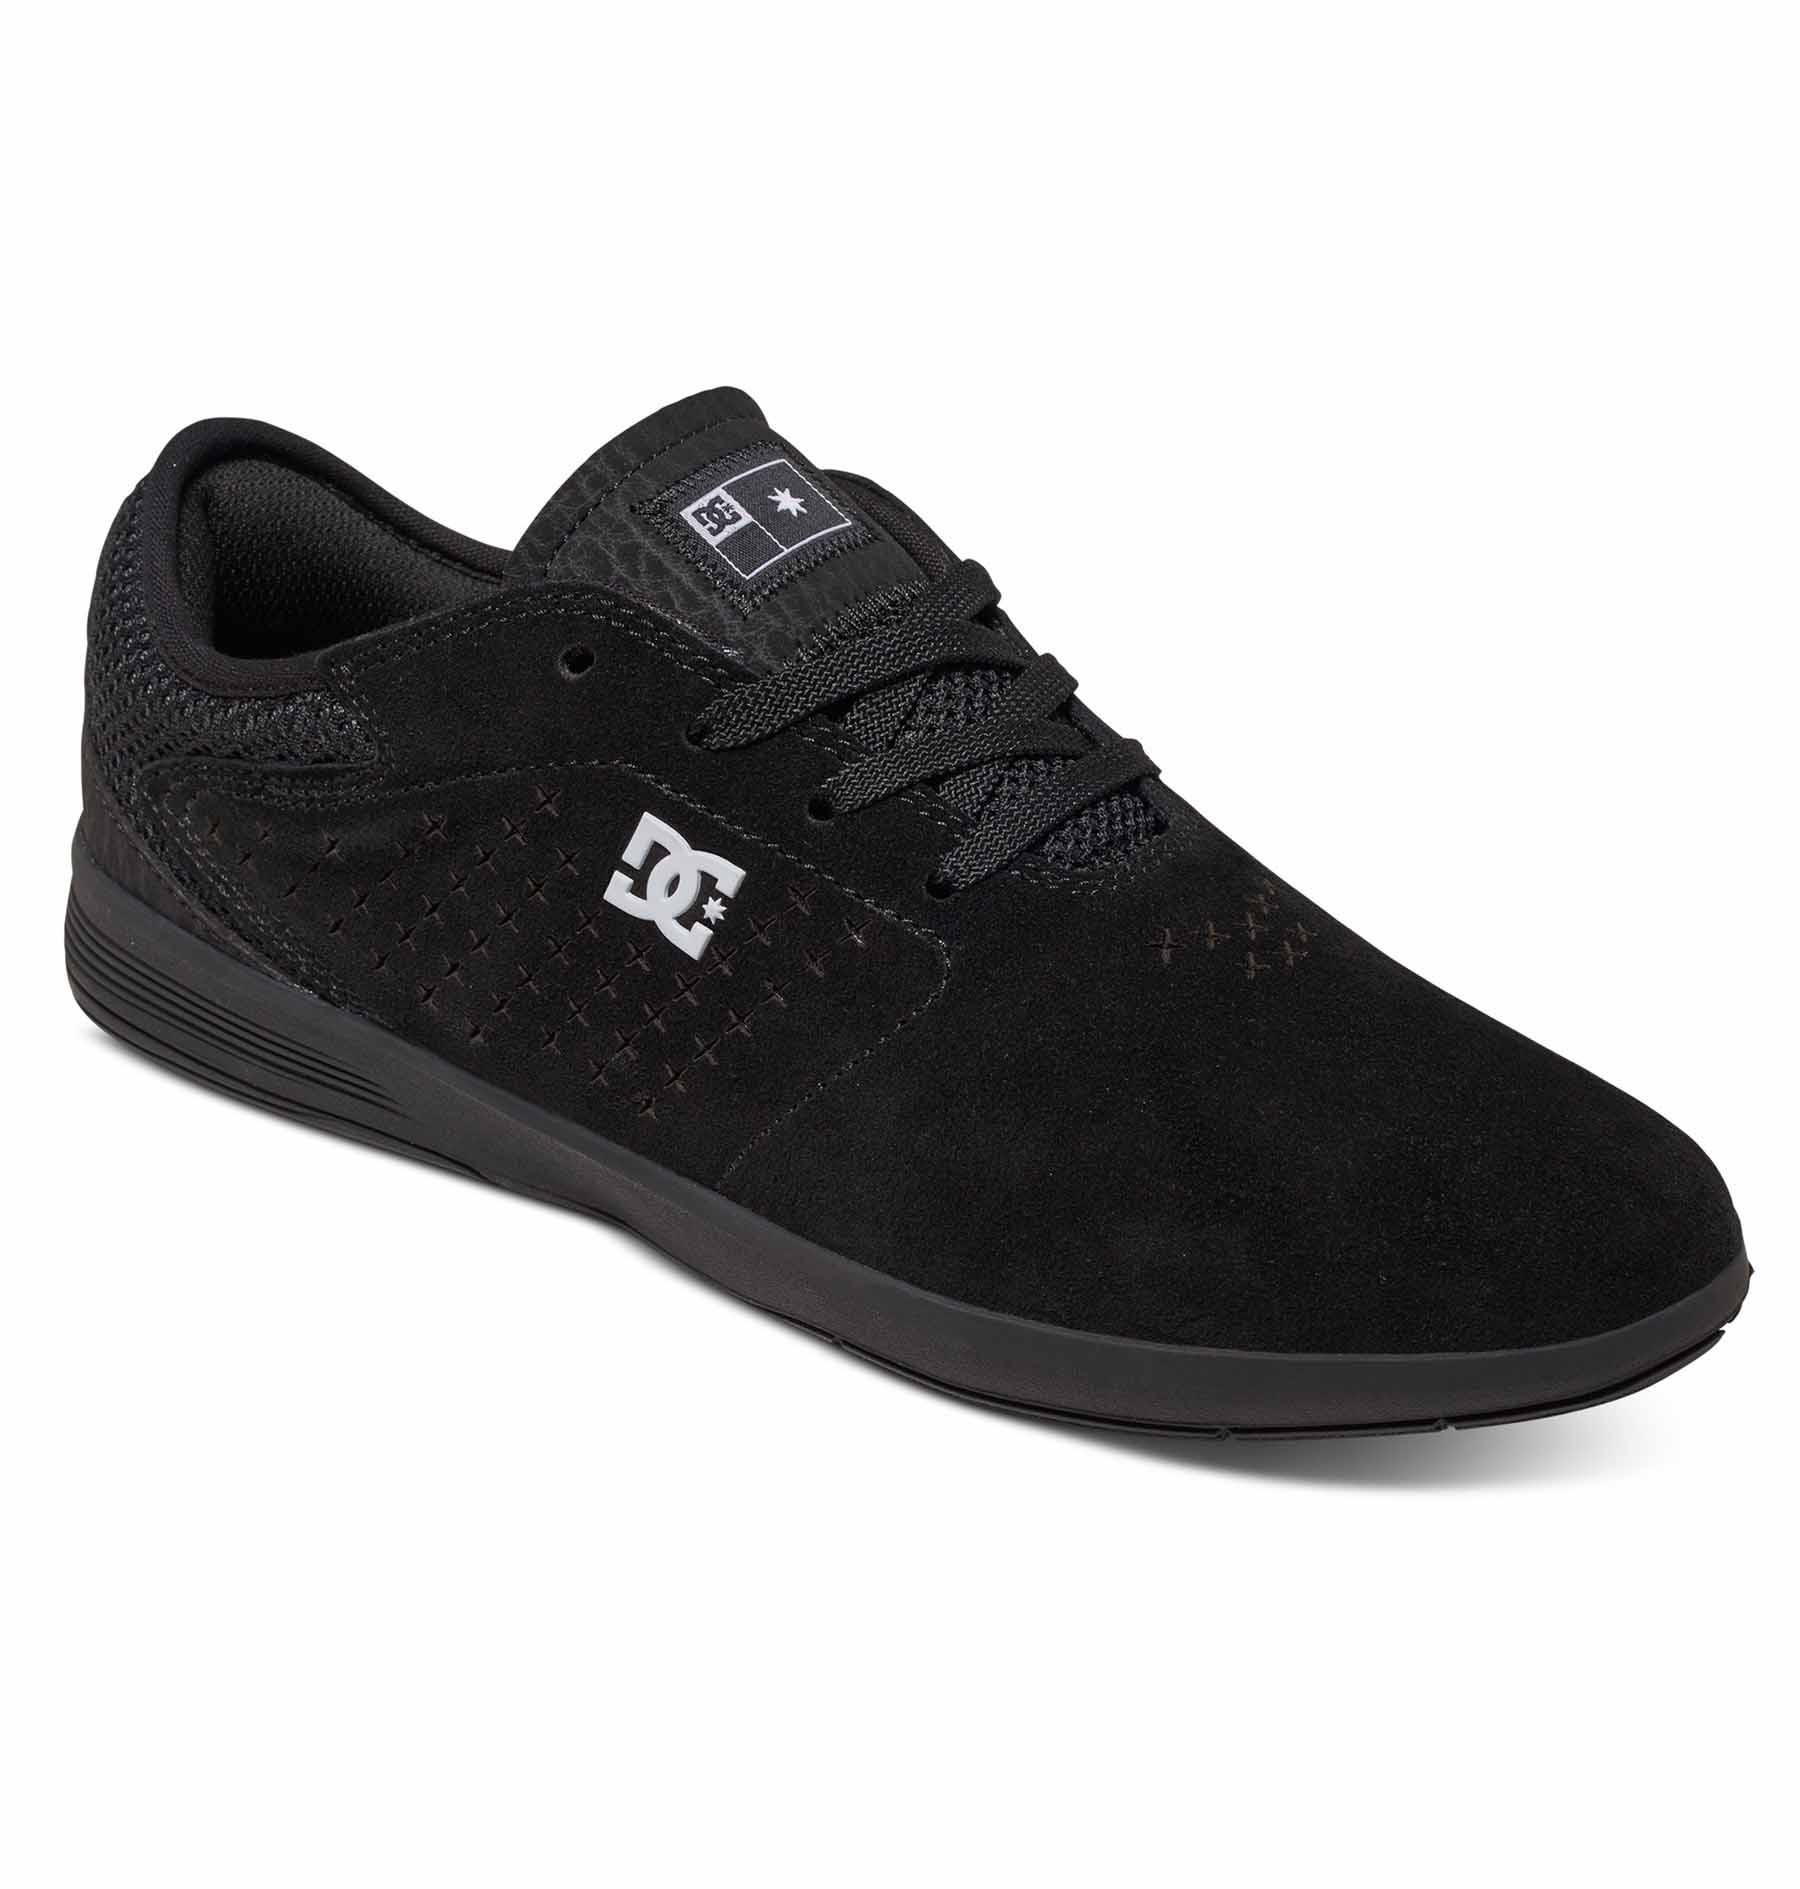 Dc Mens New Jack S Shoes Review